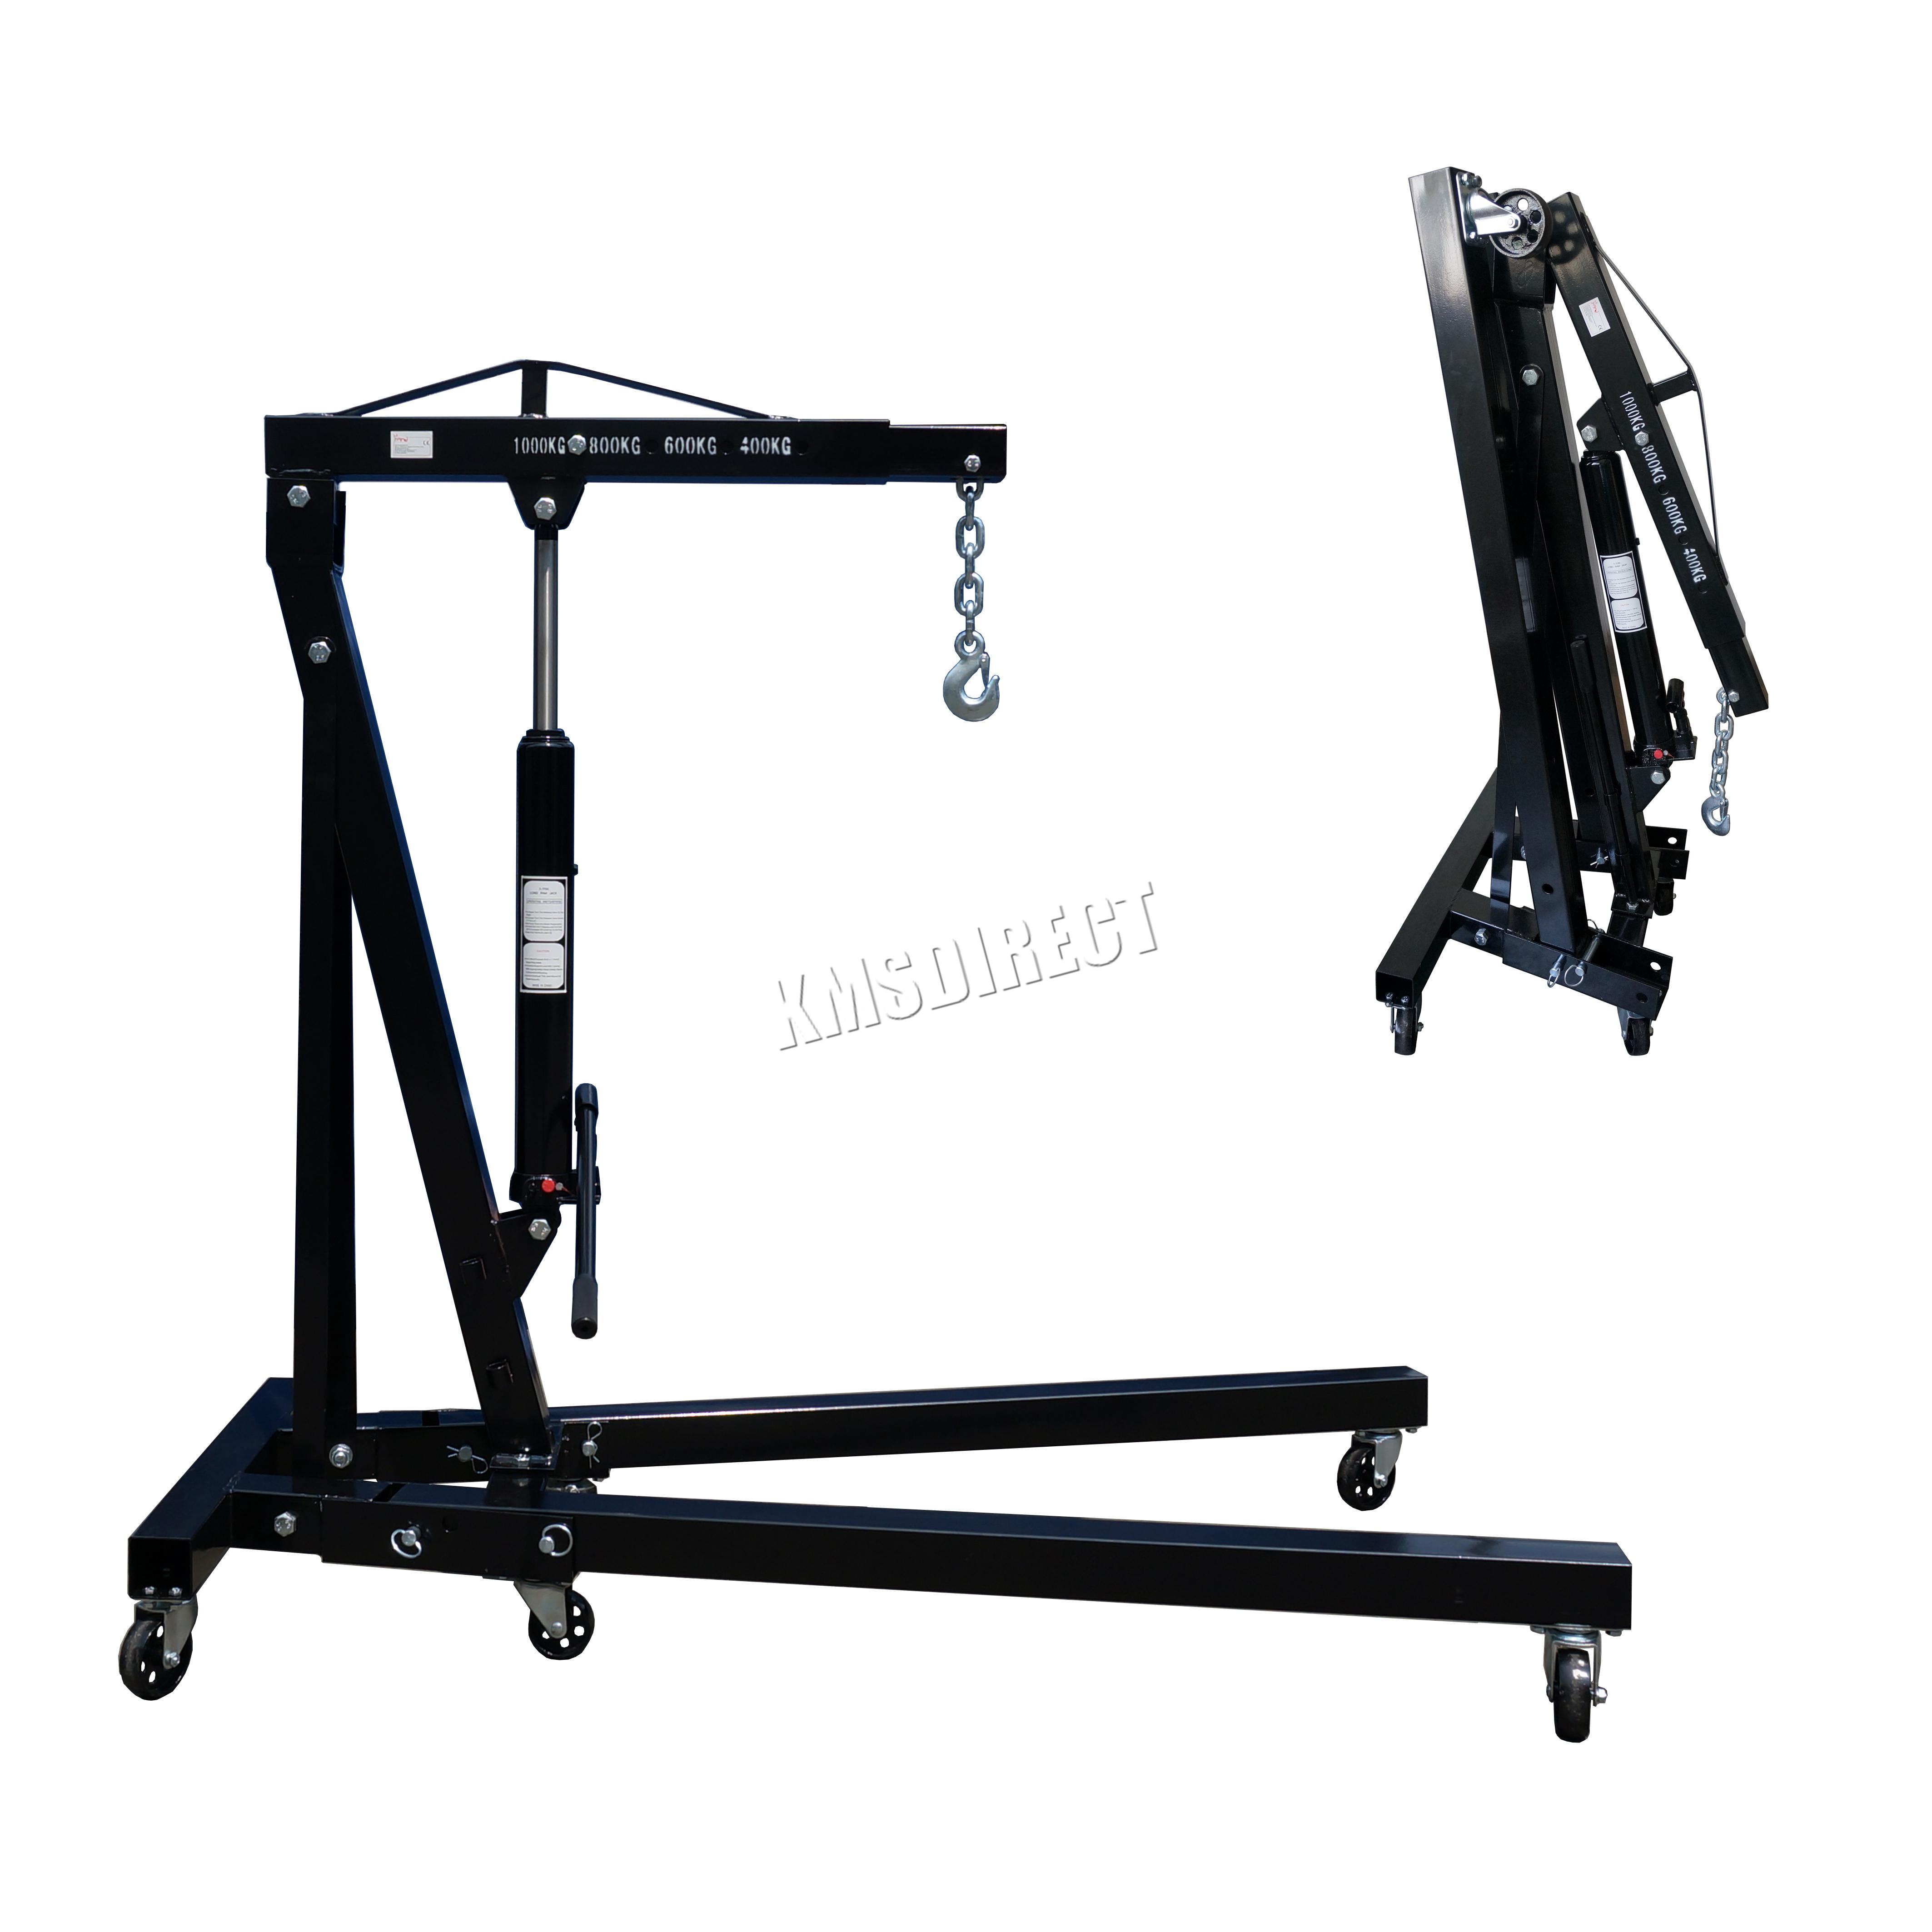 Folding Jack Stands >> FoxHunter 1 Ton Hydraulic Folding Engine Crane Hoist lift Jack SX0103-2 Black | eBay